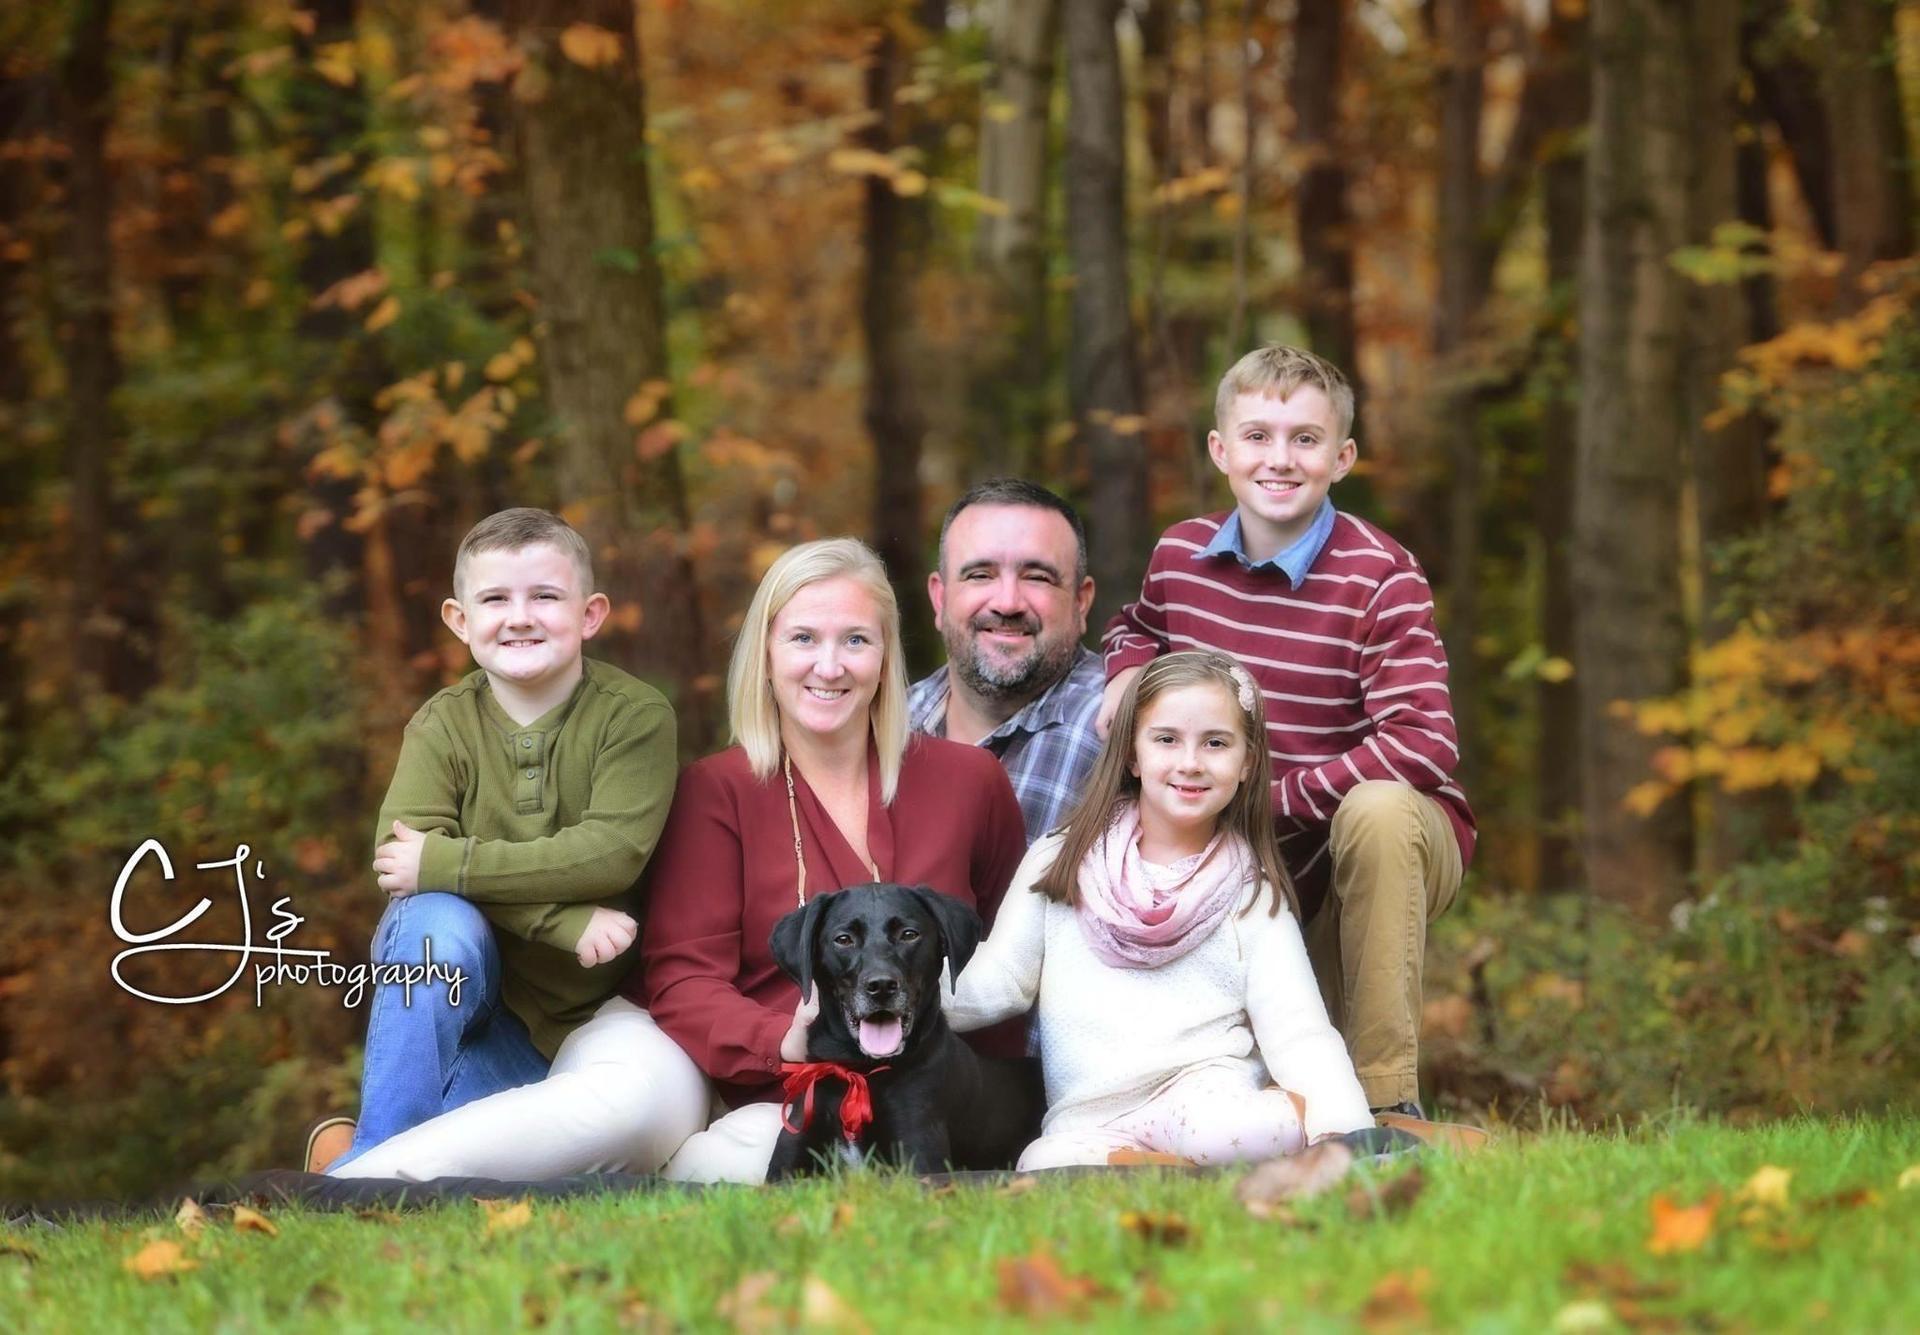 My Family (Dawn, Xander-13, Carter- 9, Emerson -7)